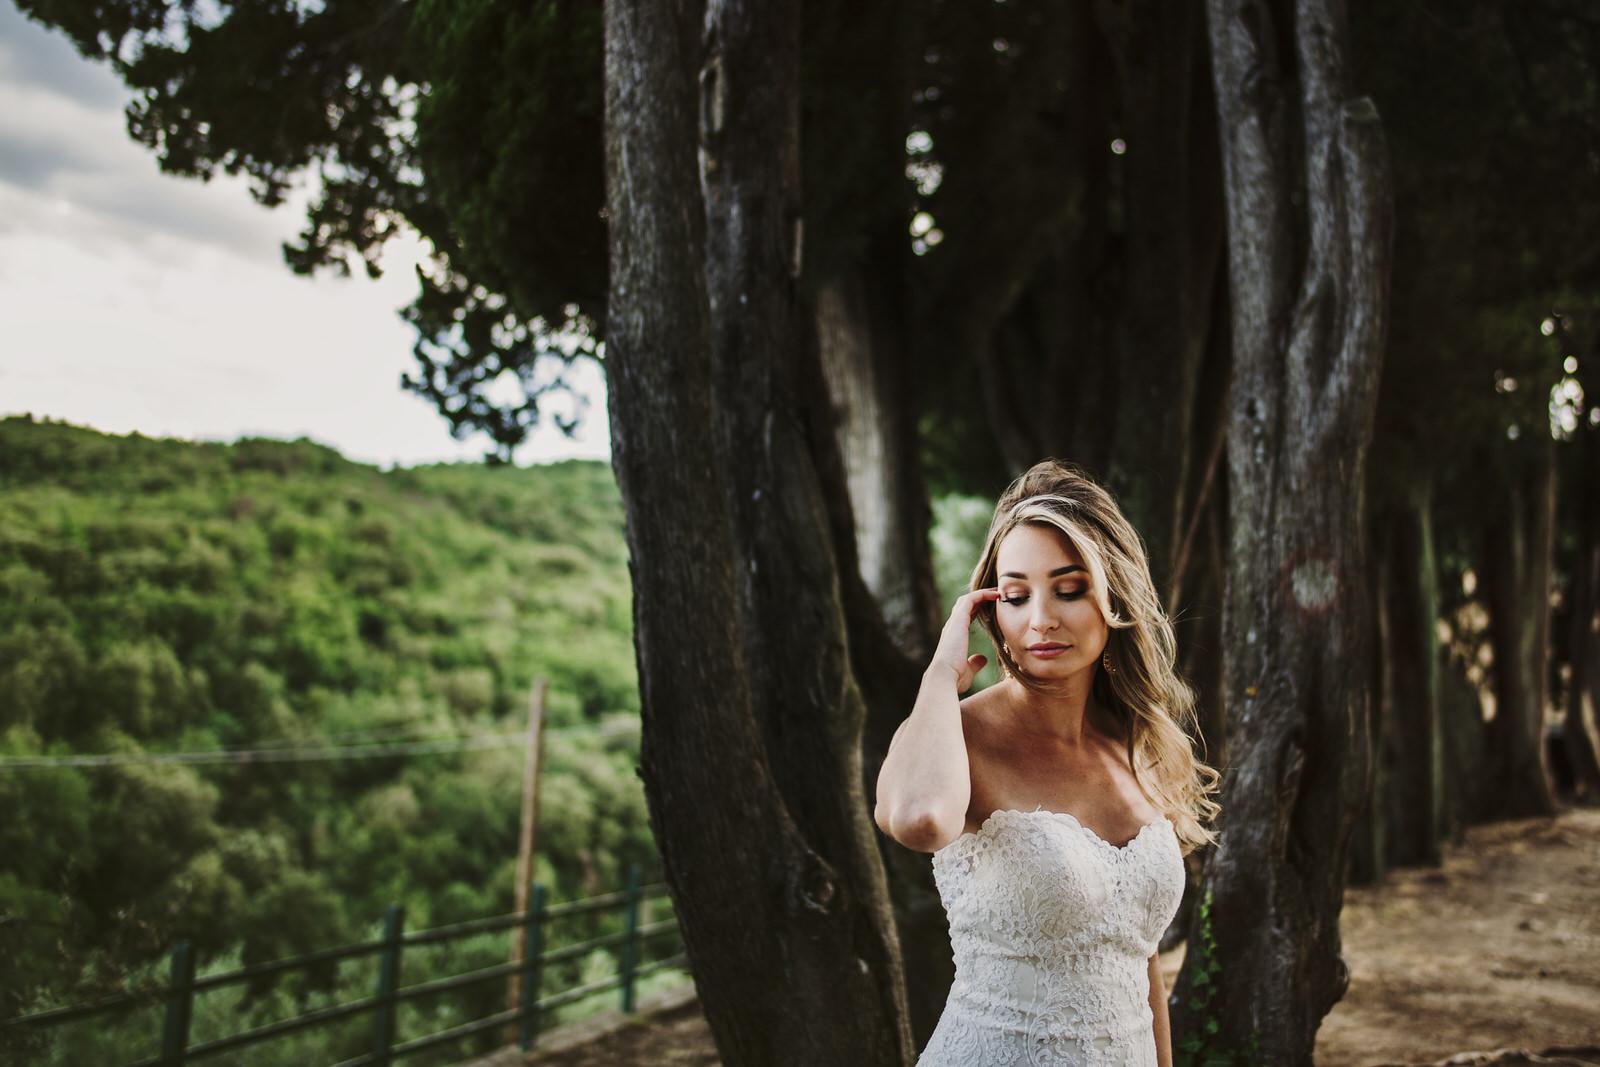 wedding photographer in italy-venice-tuscany-florence-amalfi coast-como lake-villa del balbianello-siena-amalfi-ravello-belmond-villa cimbrone66